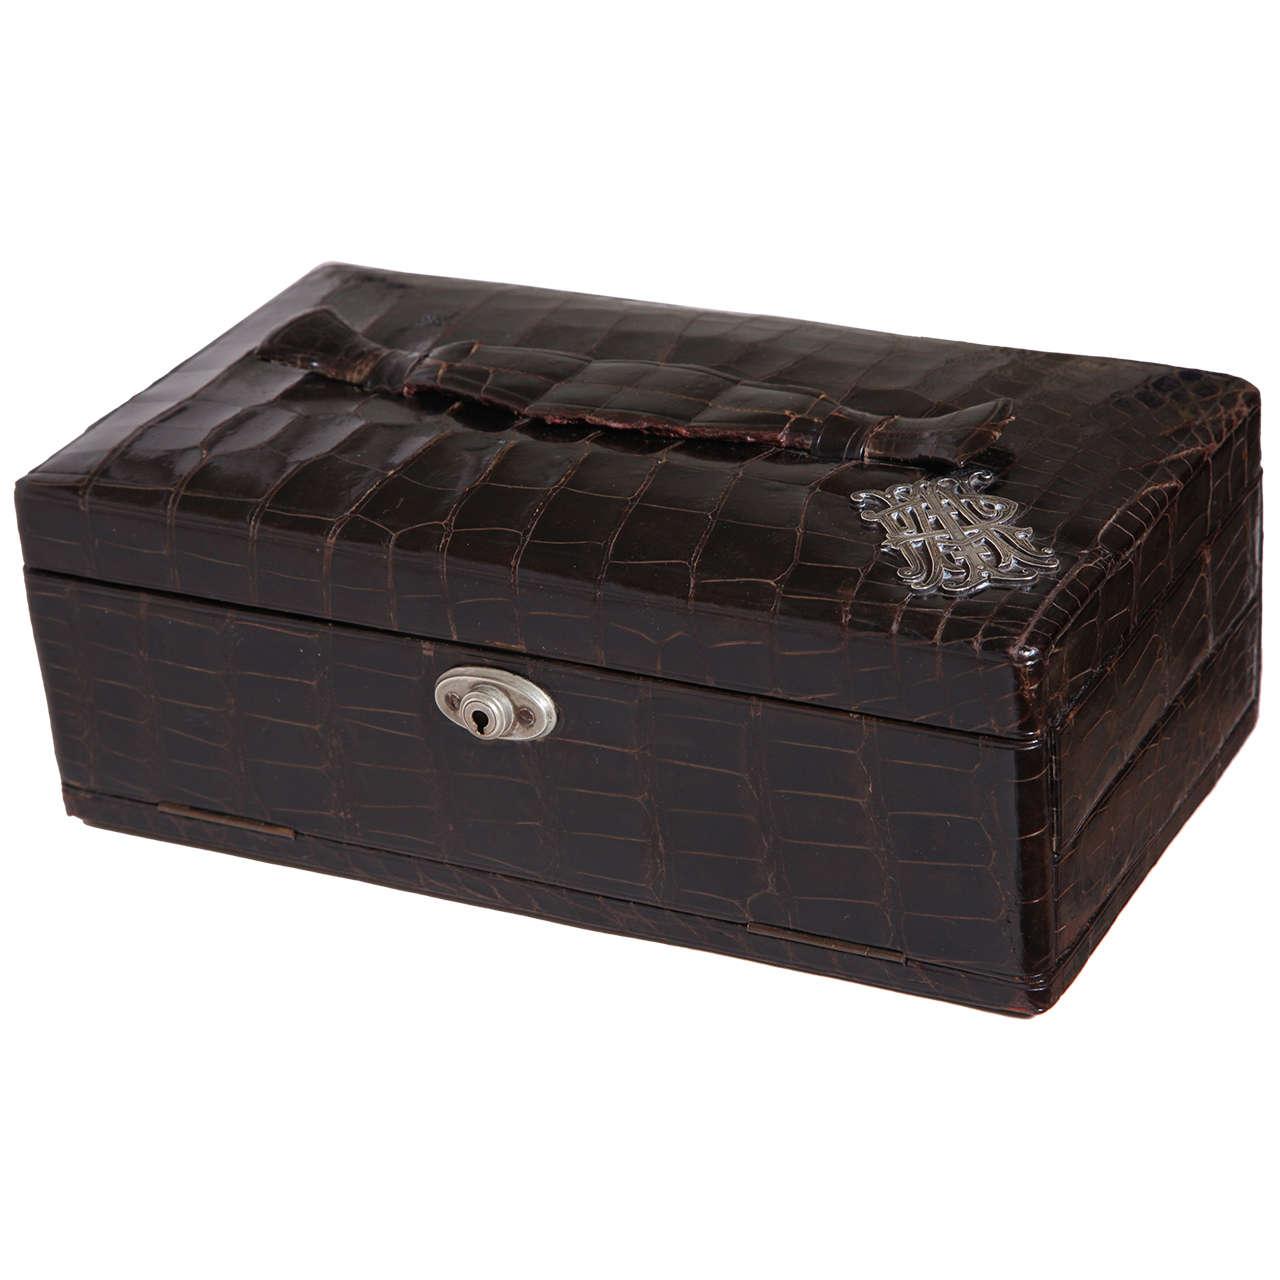 RW Forsyth Ltd Scottish Art Deco Alligator Jewelry Box For Sale